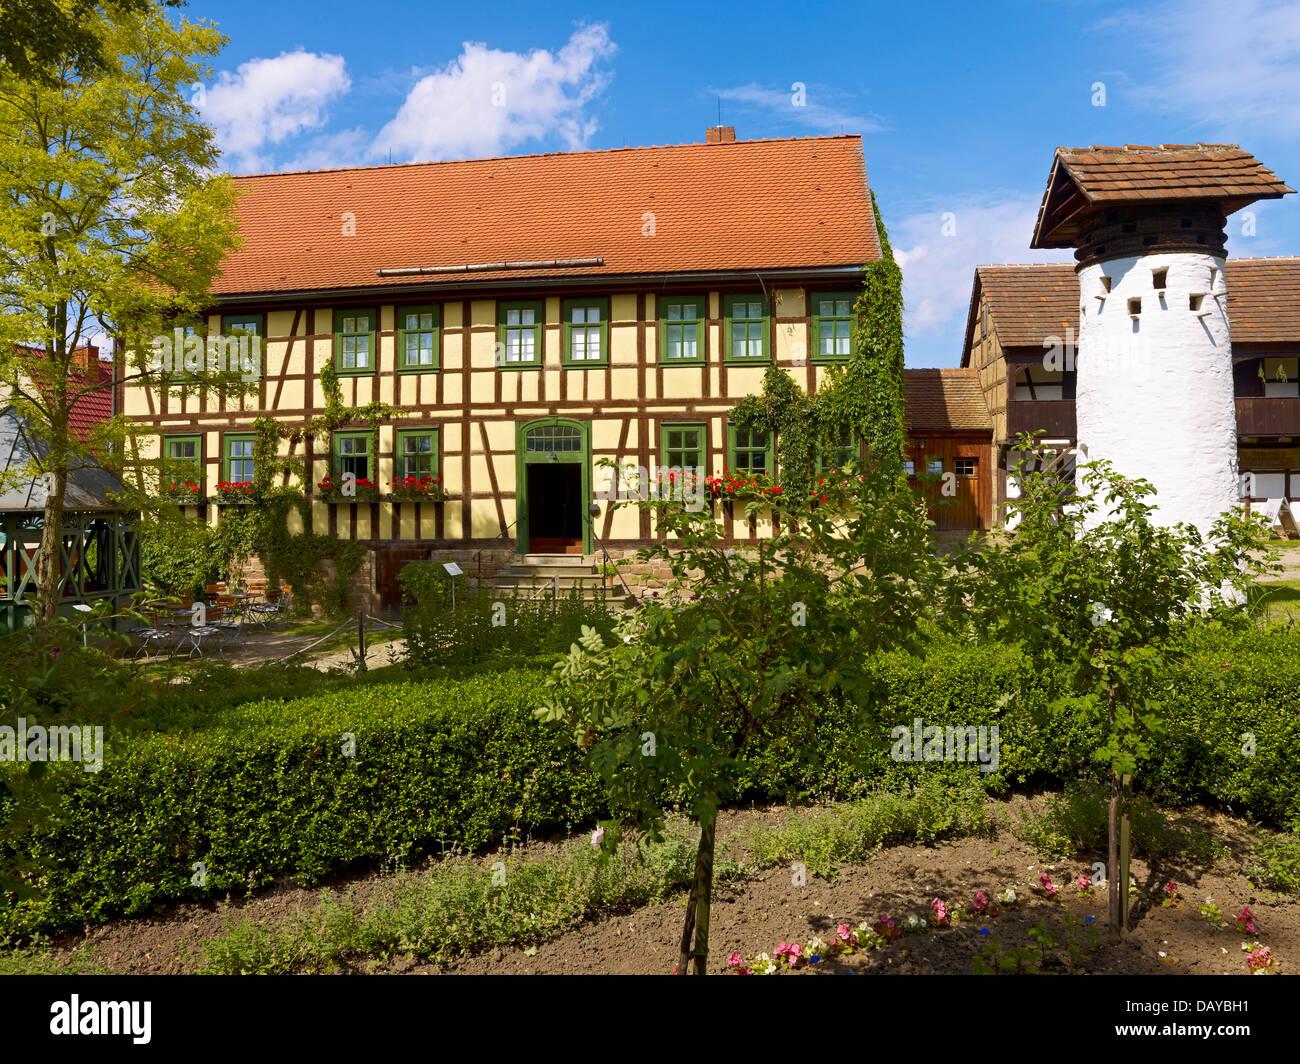 Open air museum Hohenfelden, Ilmkreis, Thuringia, Germany - Stock Image